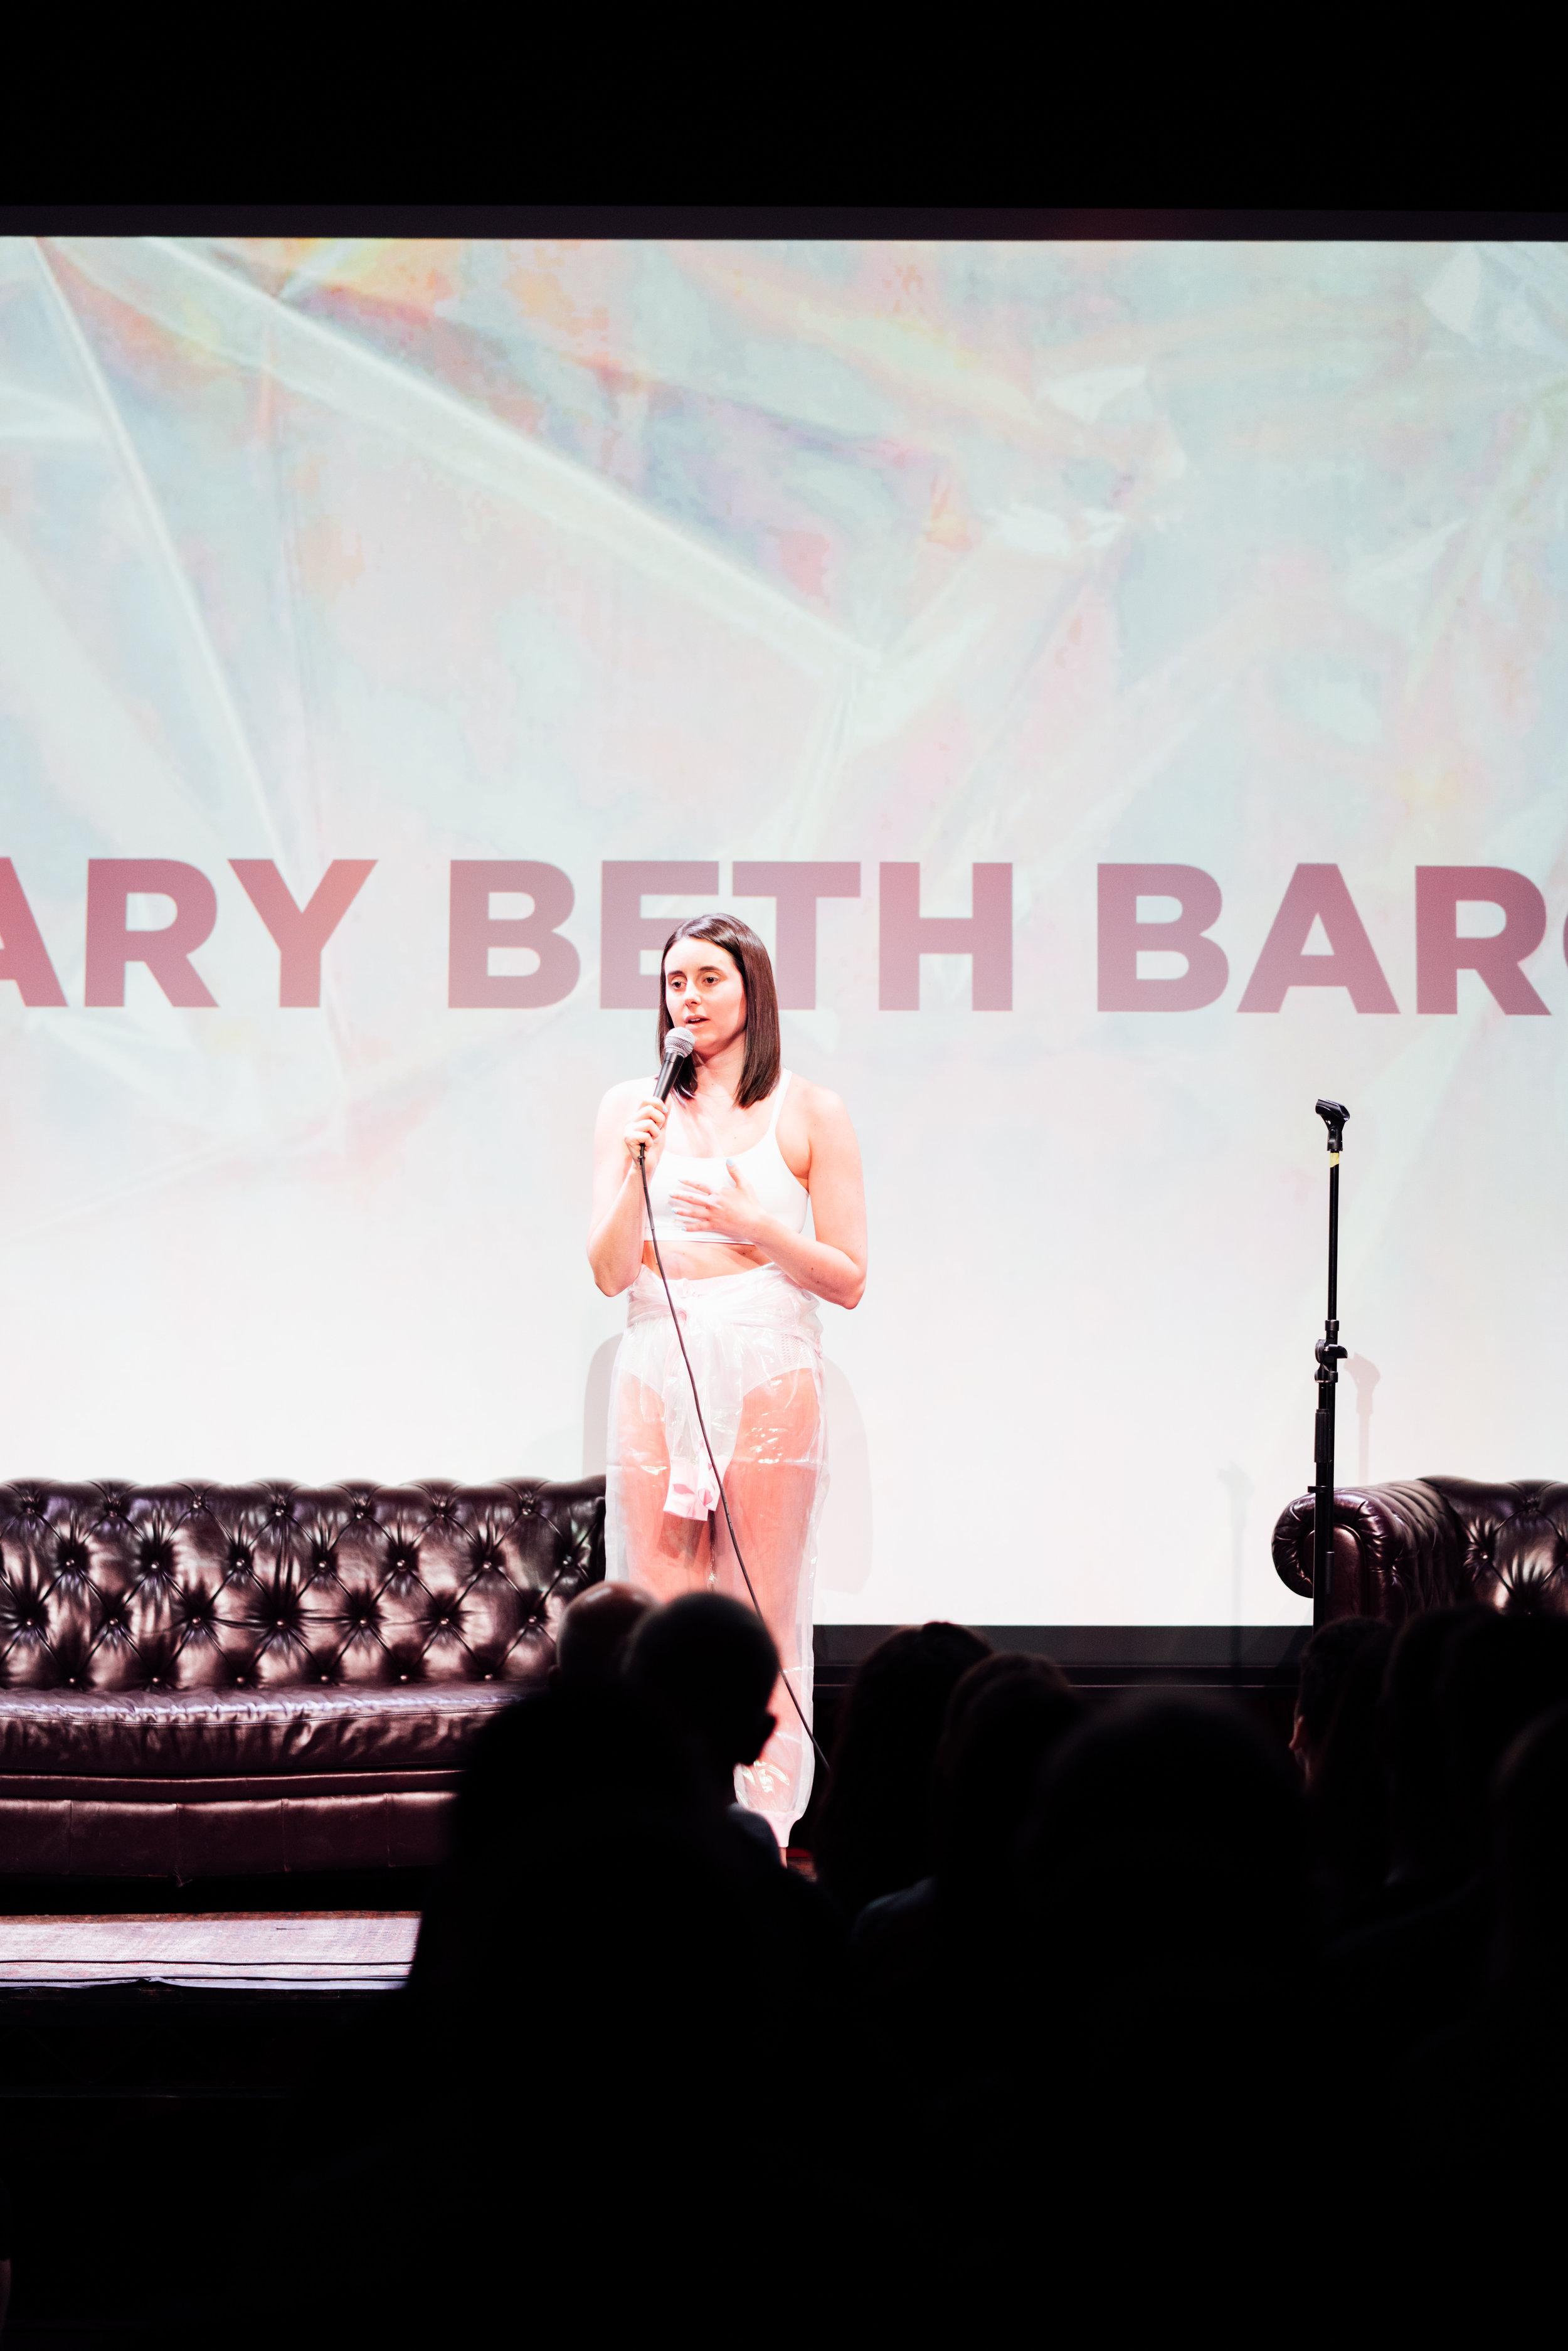 the-exhibition-mary-beth-barone.jpg